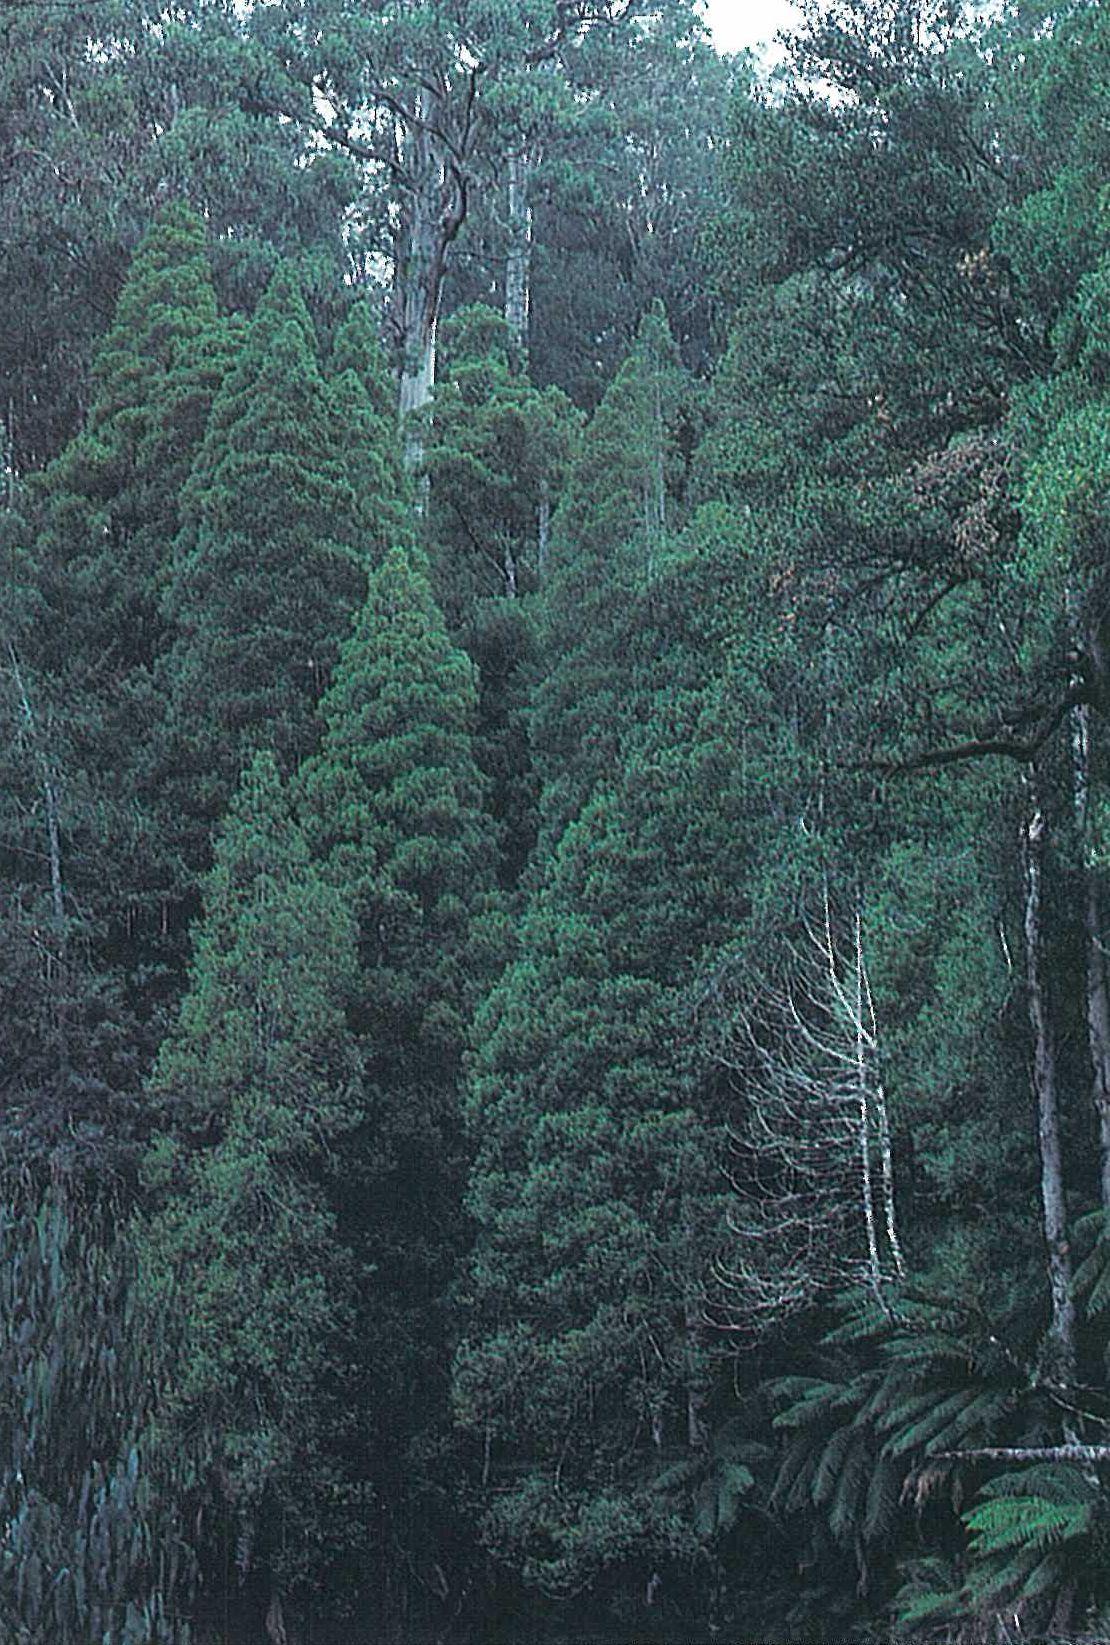 East Gippsland; cool temparate rainforest. Characteristic conical trees of Atherospermum moschatum, with Dicksonia antarctica and Elaeocarpus holopetalus. Eucalyptus denticulata emergent. Errinundra plateau.